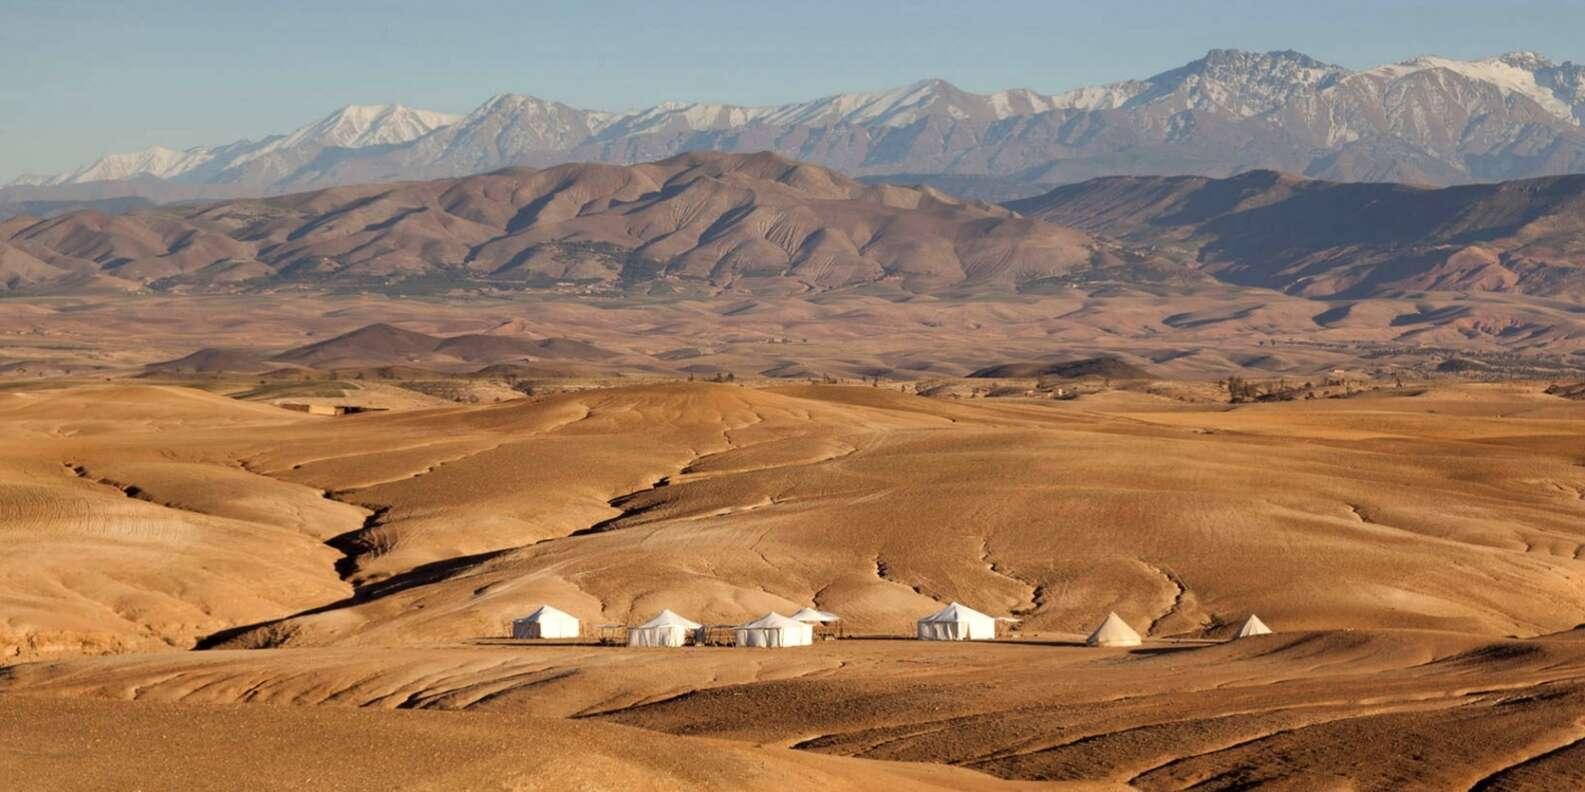 desert agafay and atlas mountains